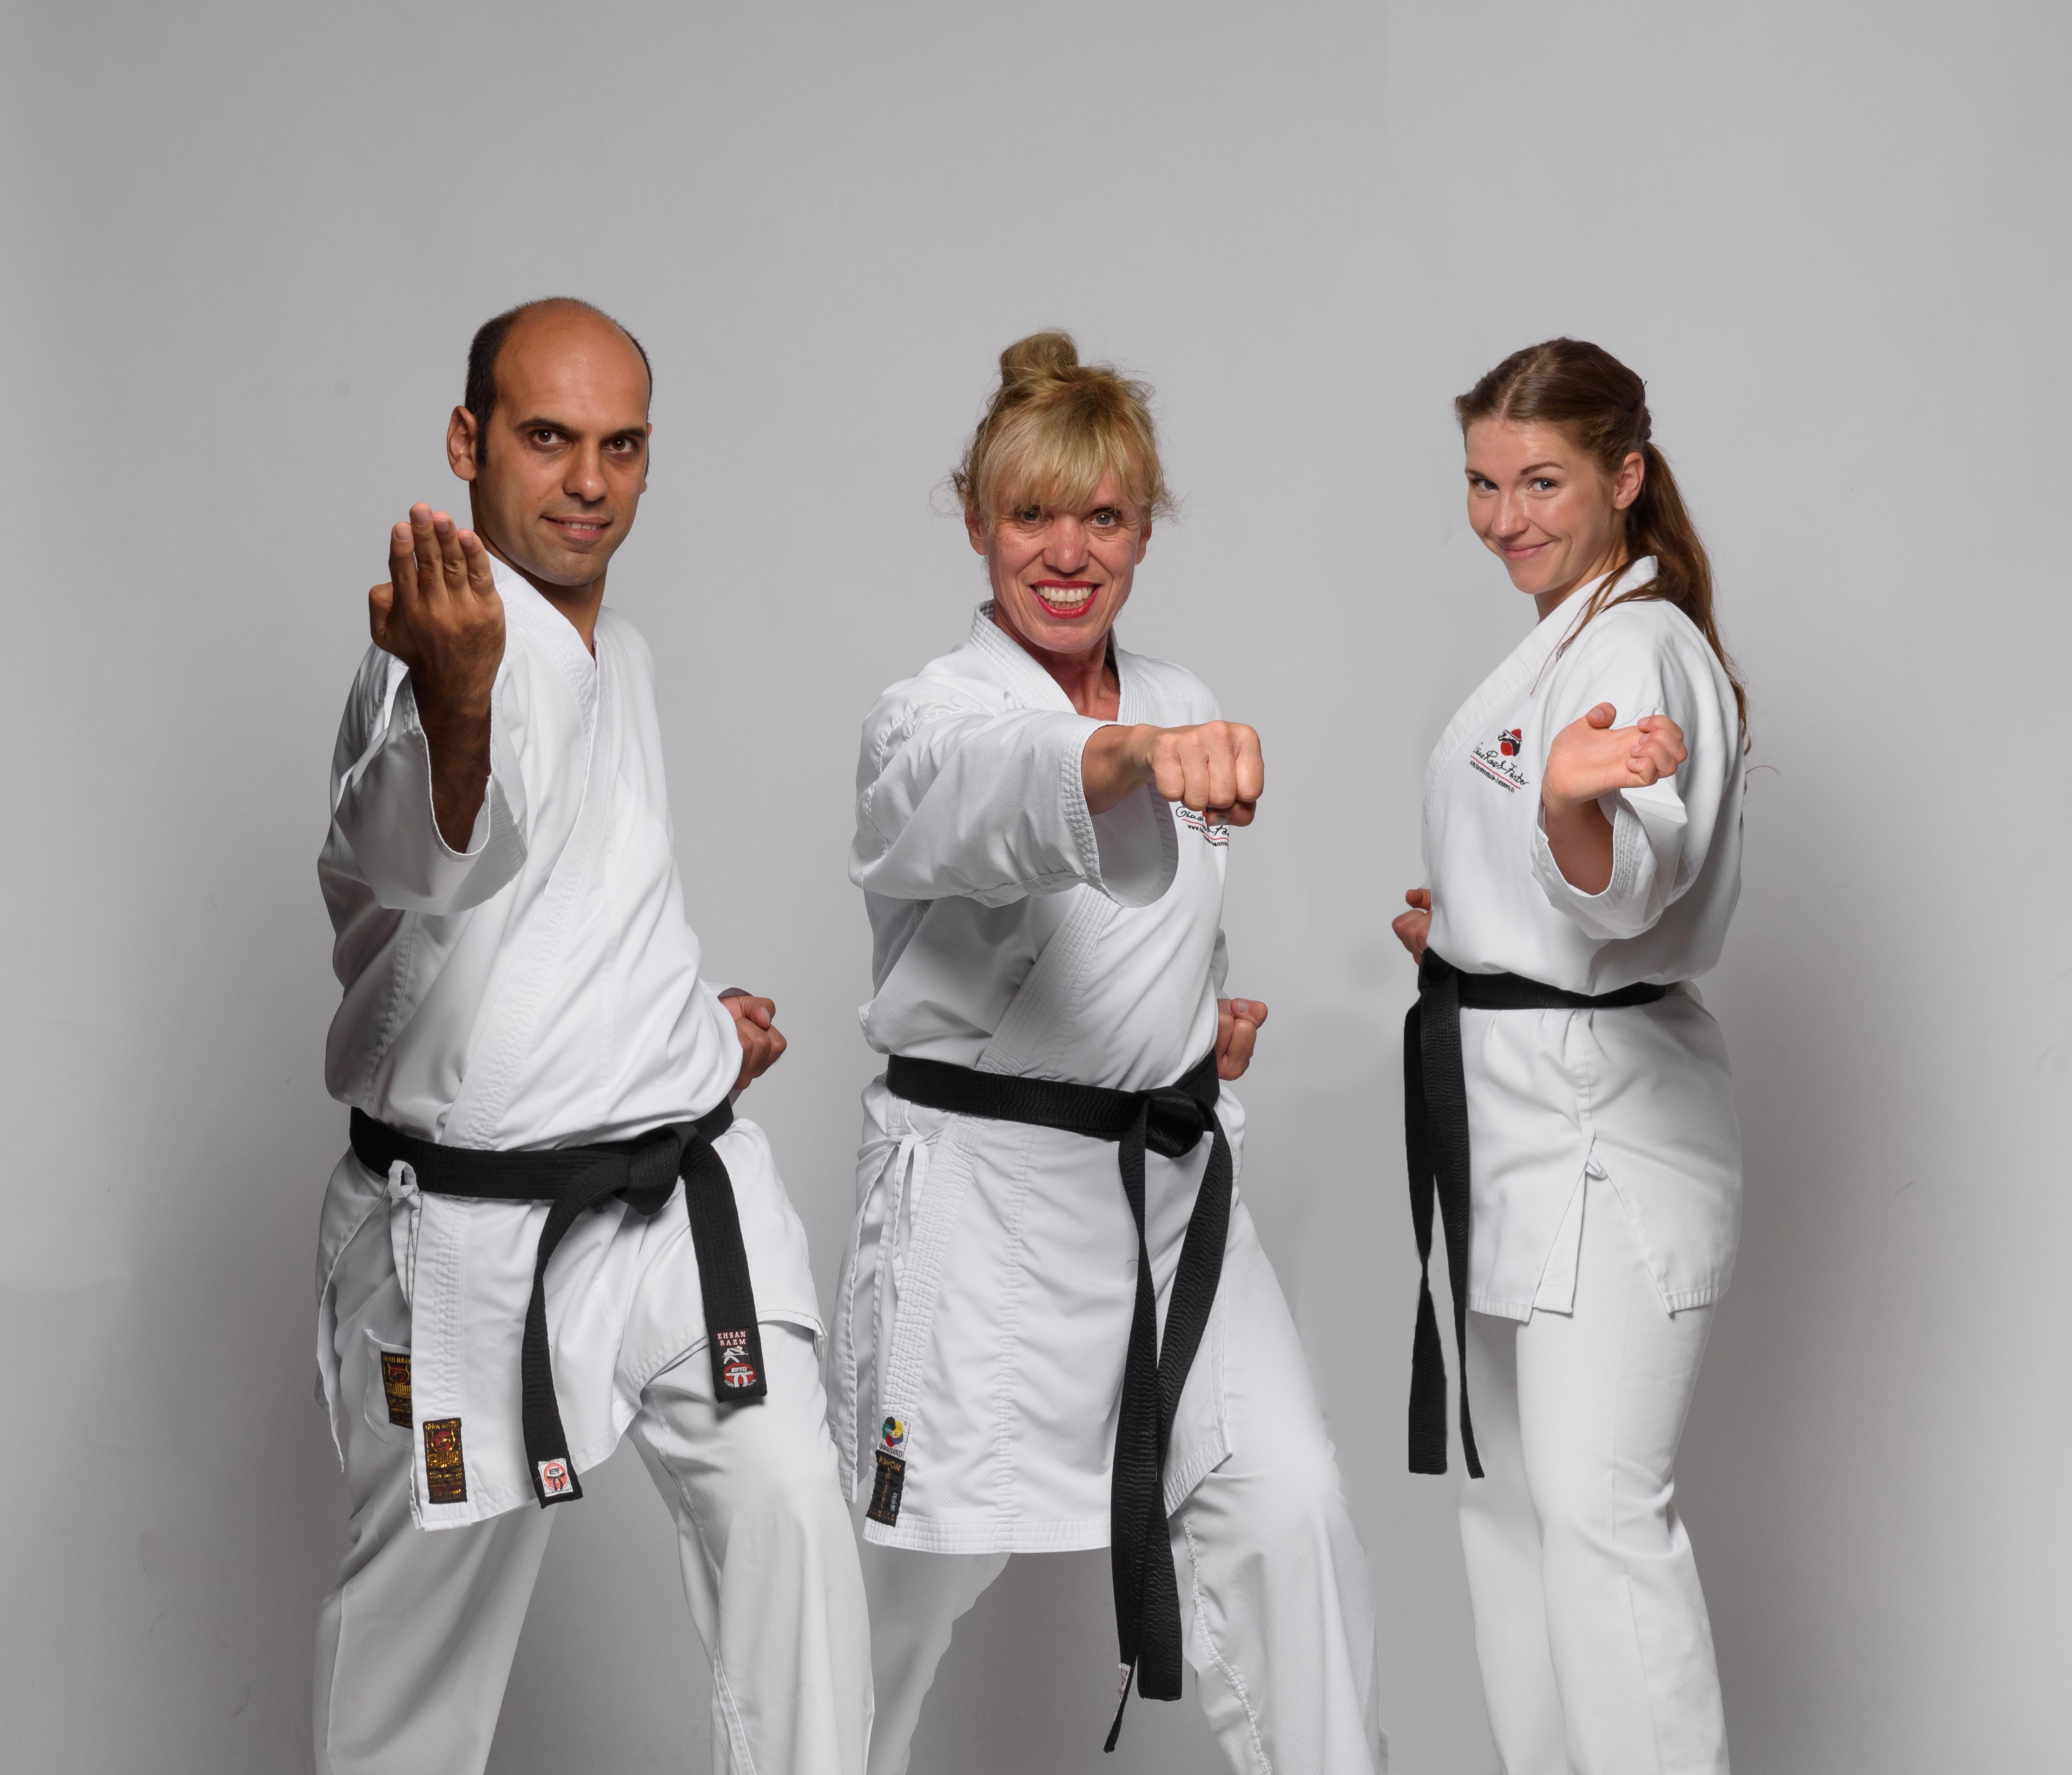 Angebote Kurse Karateschule Gina Rauh Forster